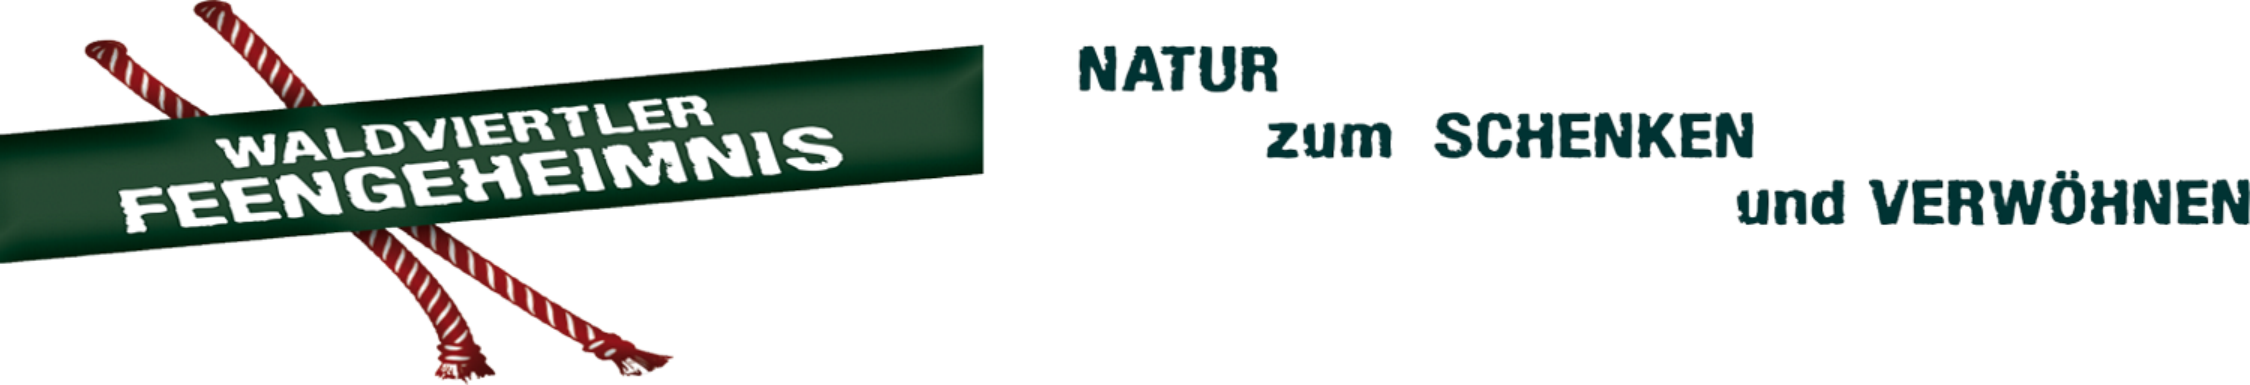 Feengeheimnis-Logo